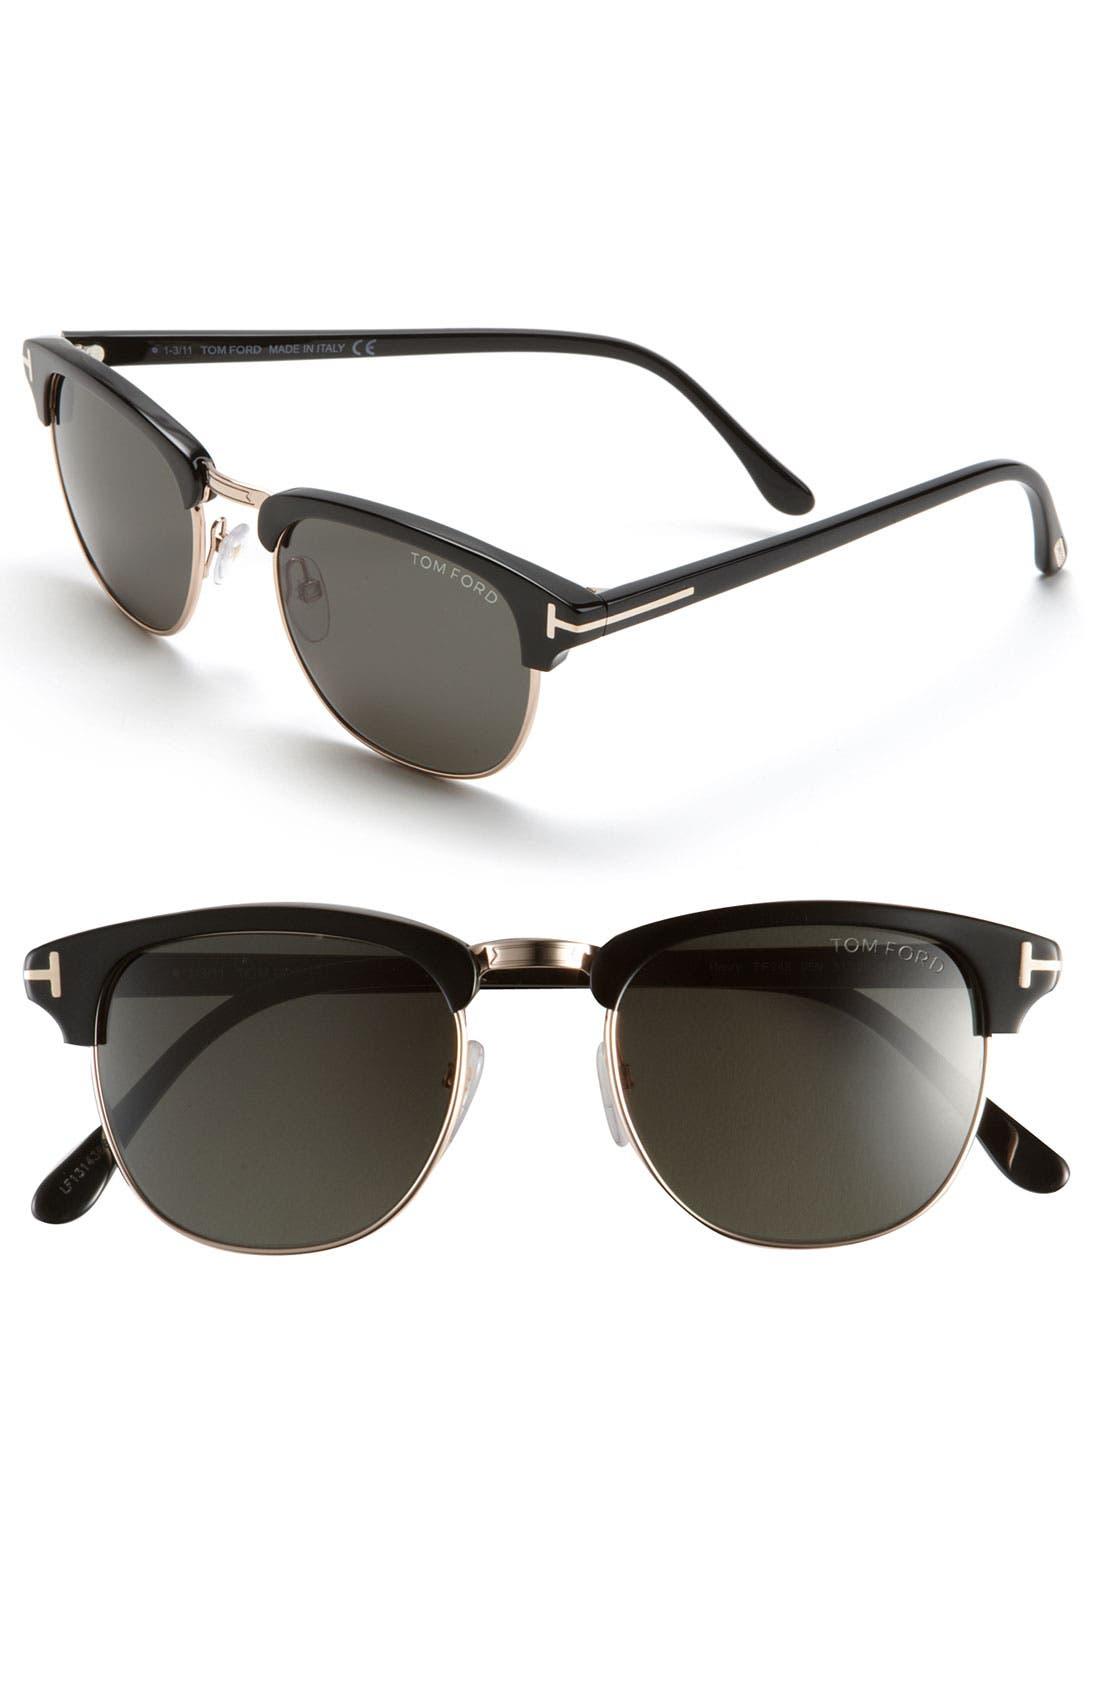 Main Image - Tom Ford 'Henry' 51mm Retro Sunglasses